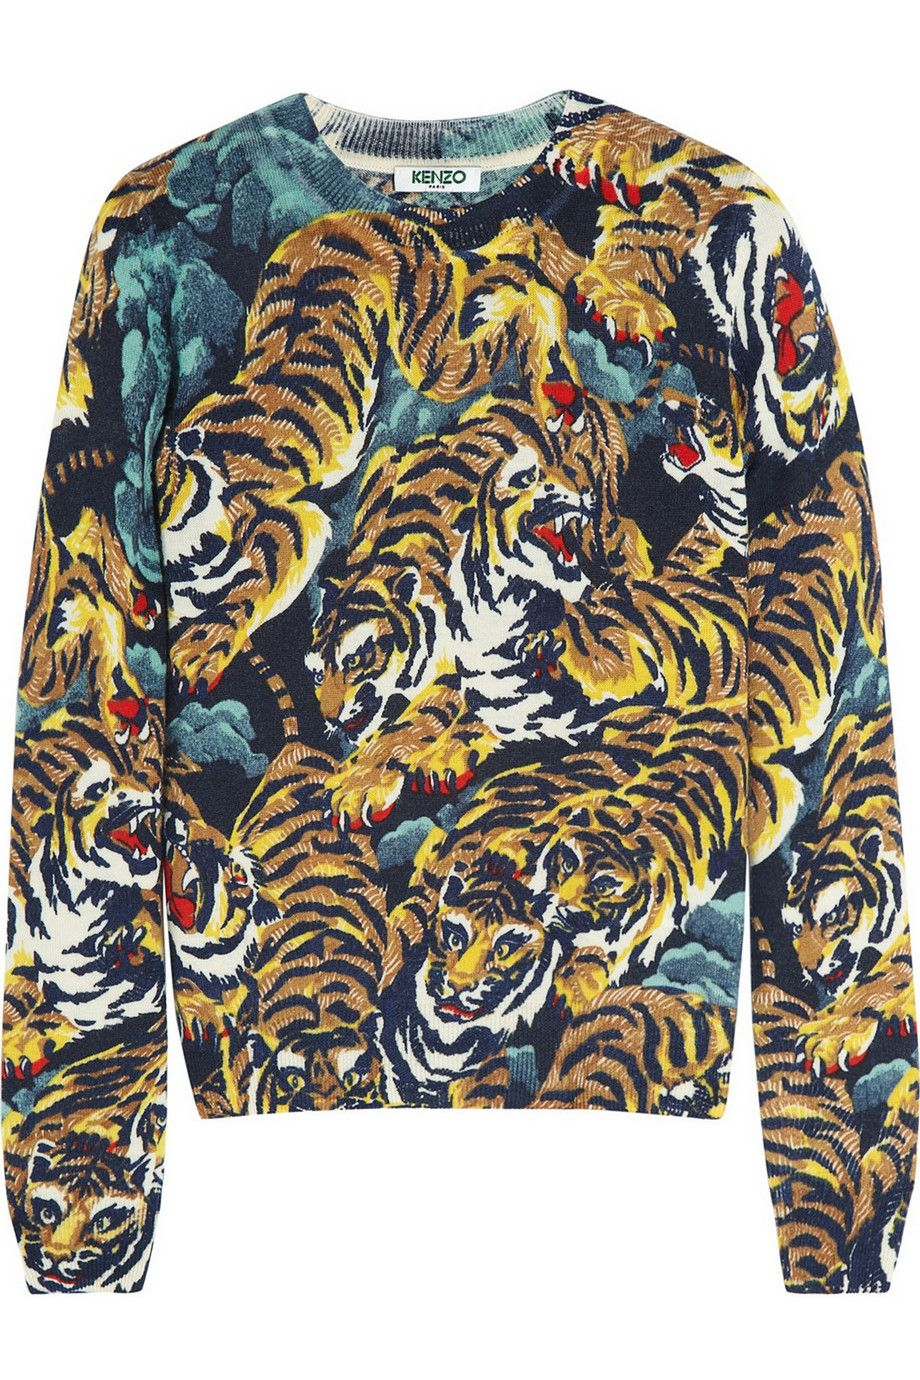 kenzo tiger jungle print wool sweater net a porter com